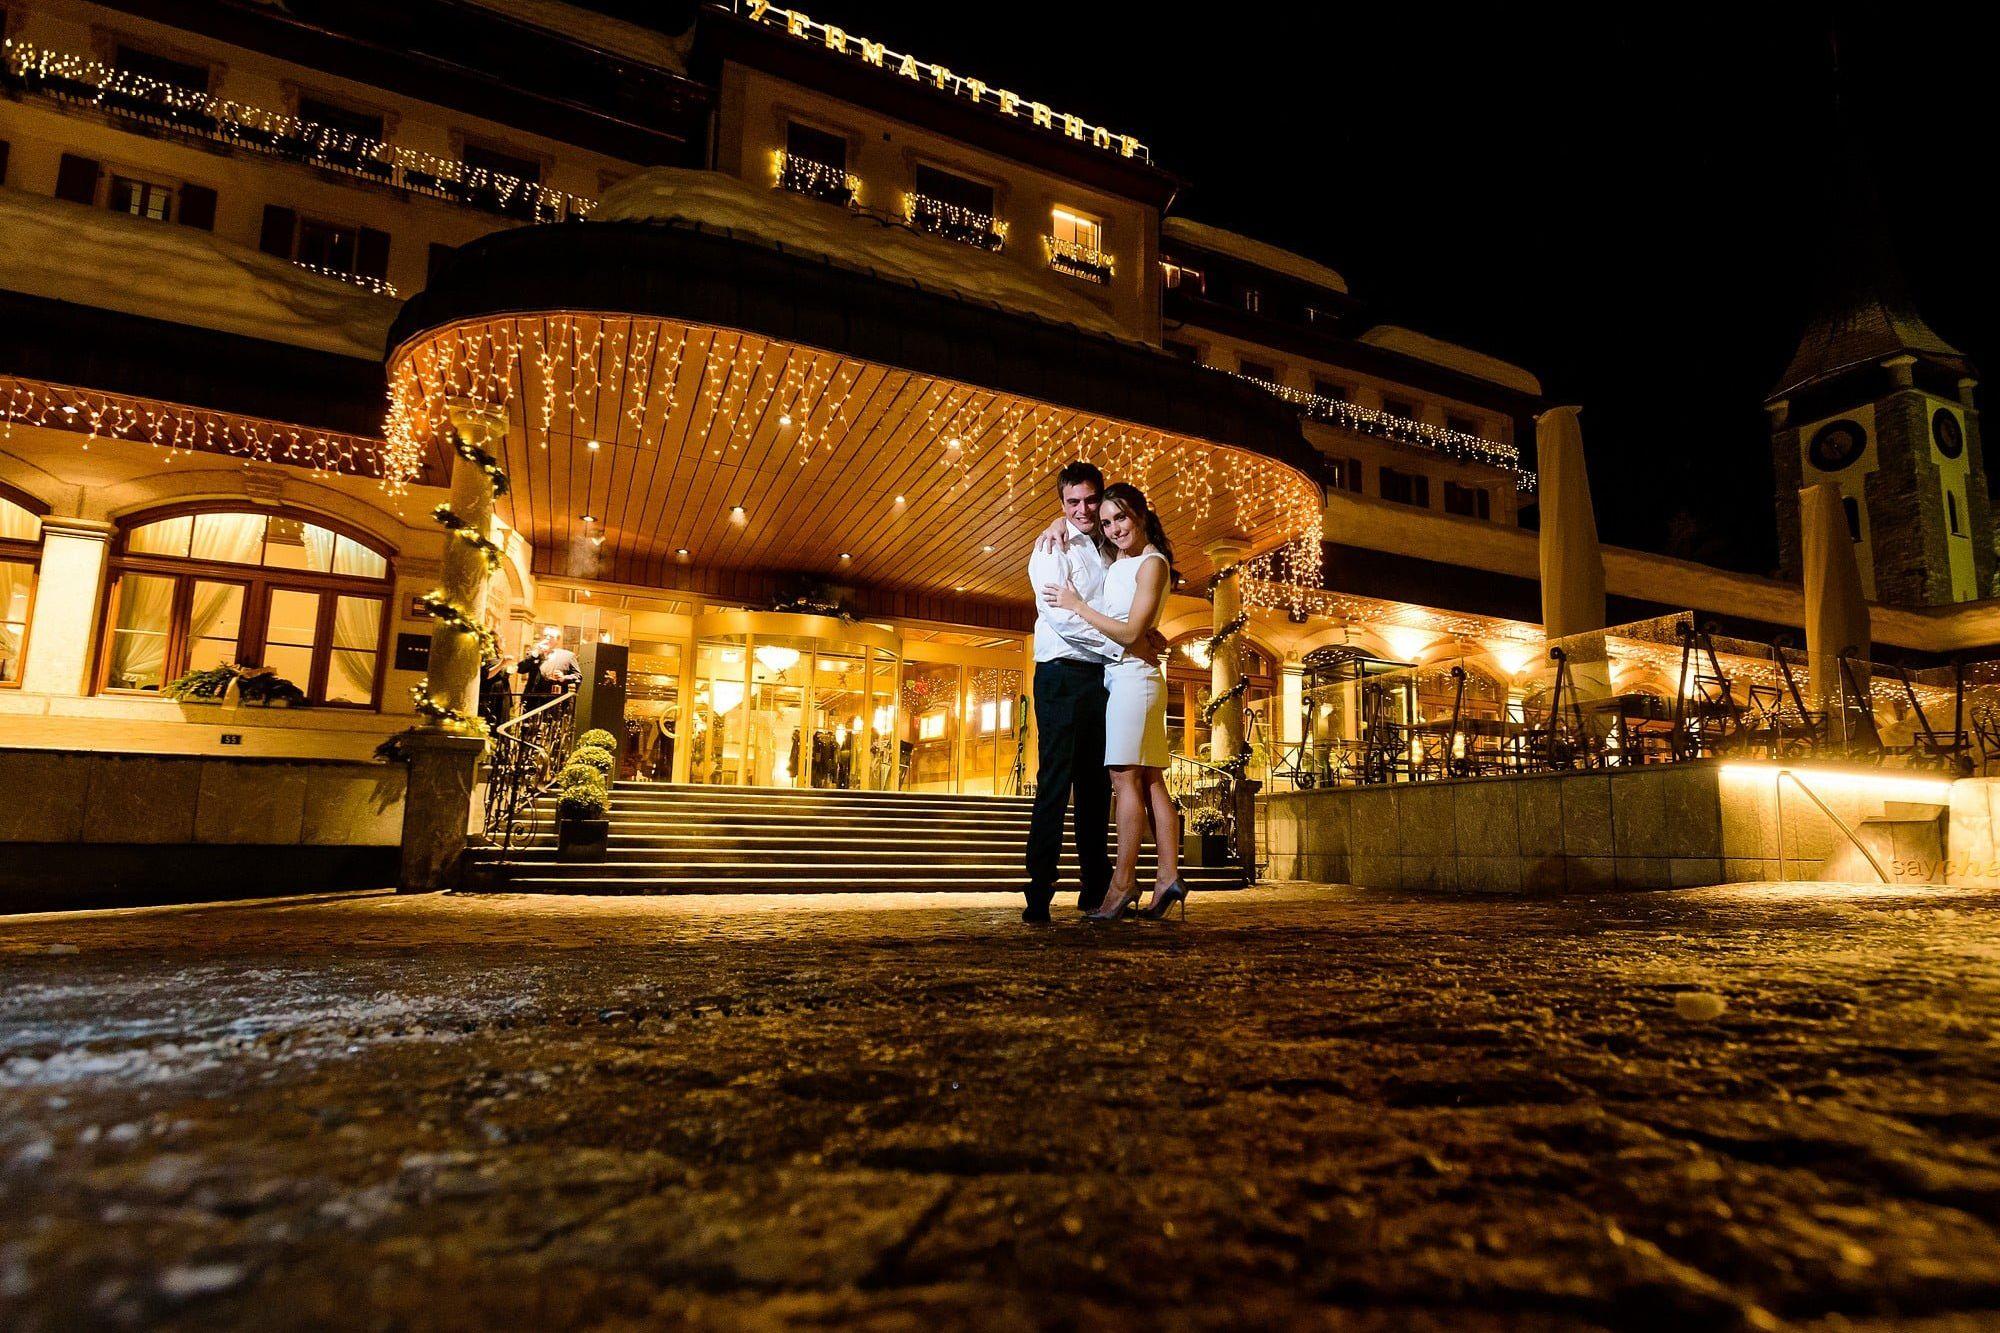 wedding at the zermatterhof